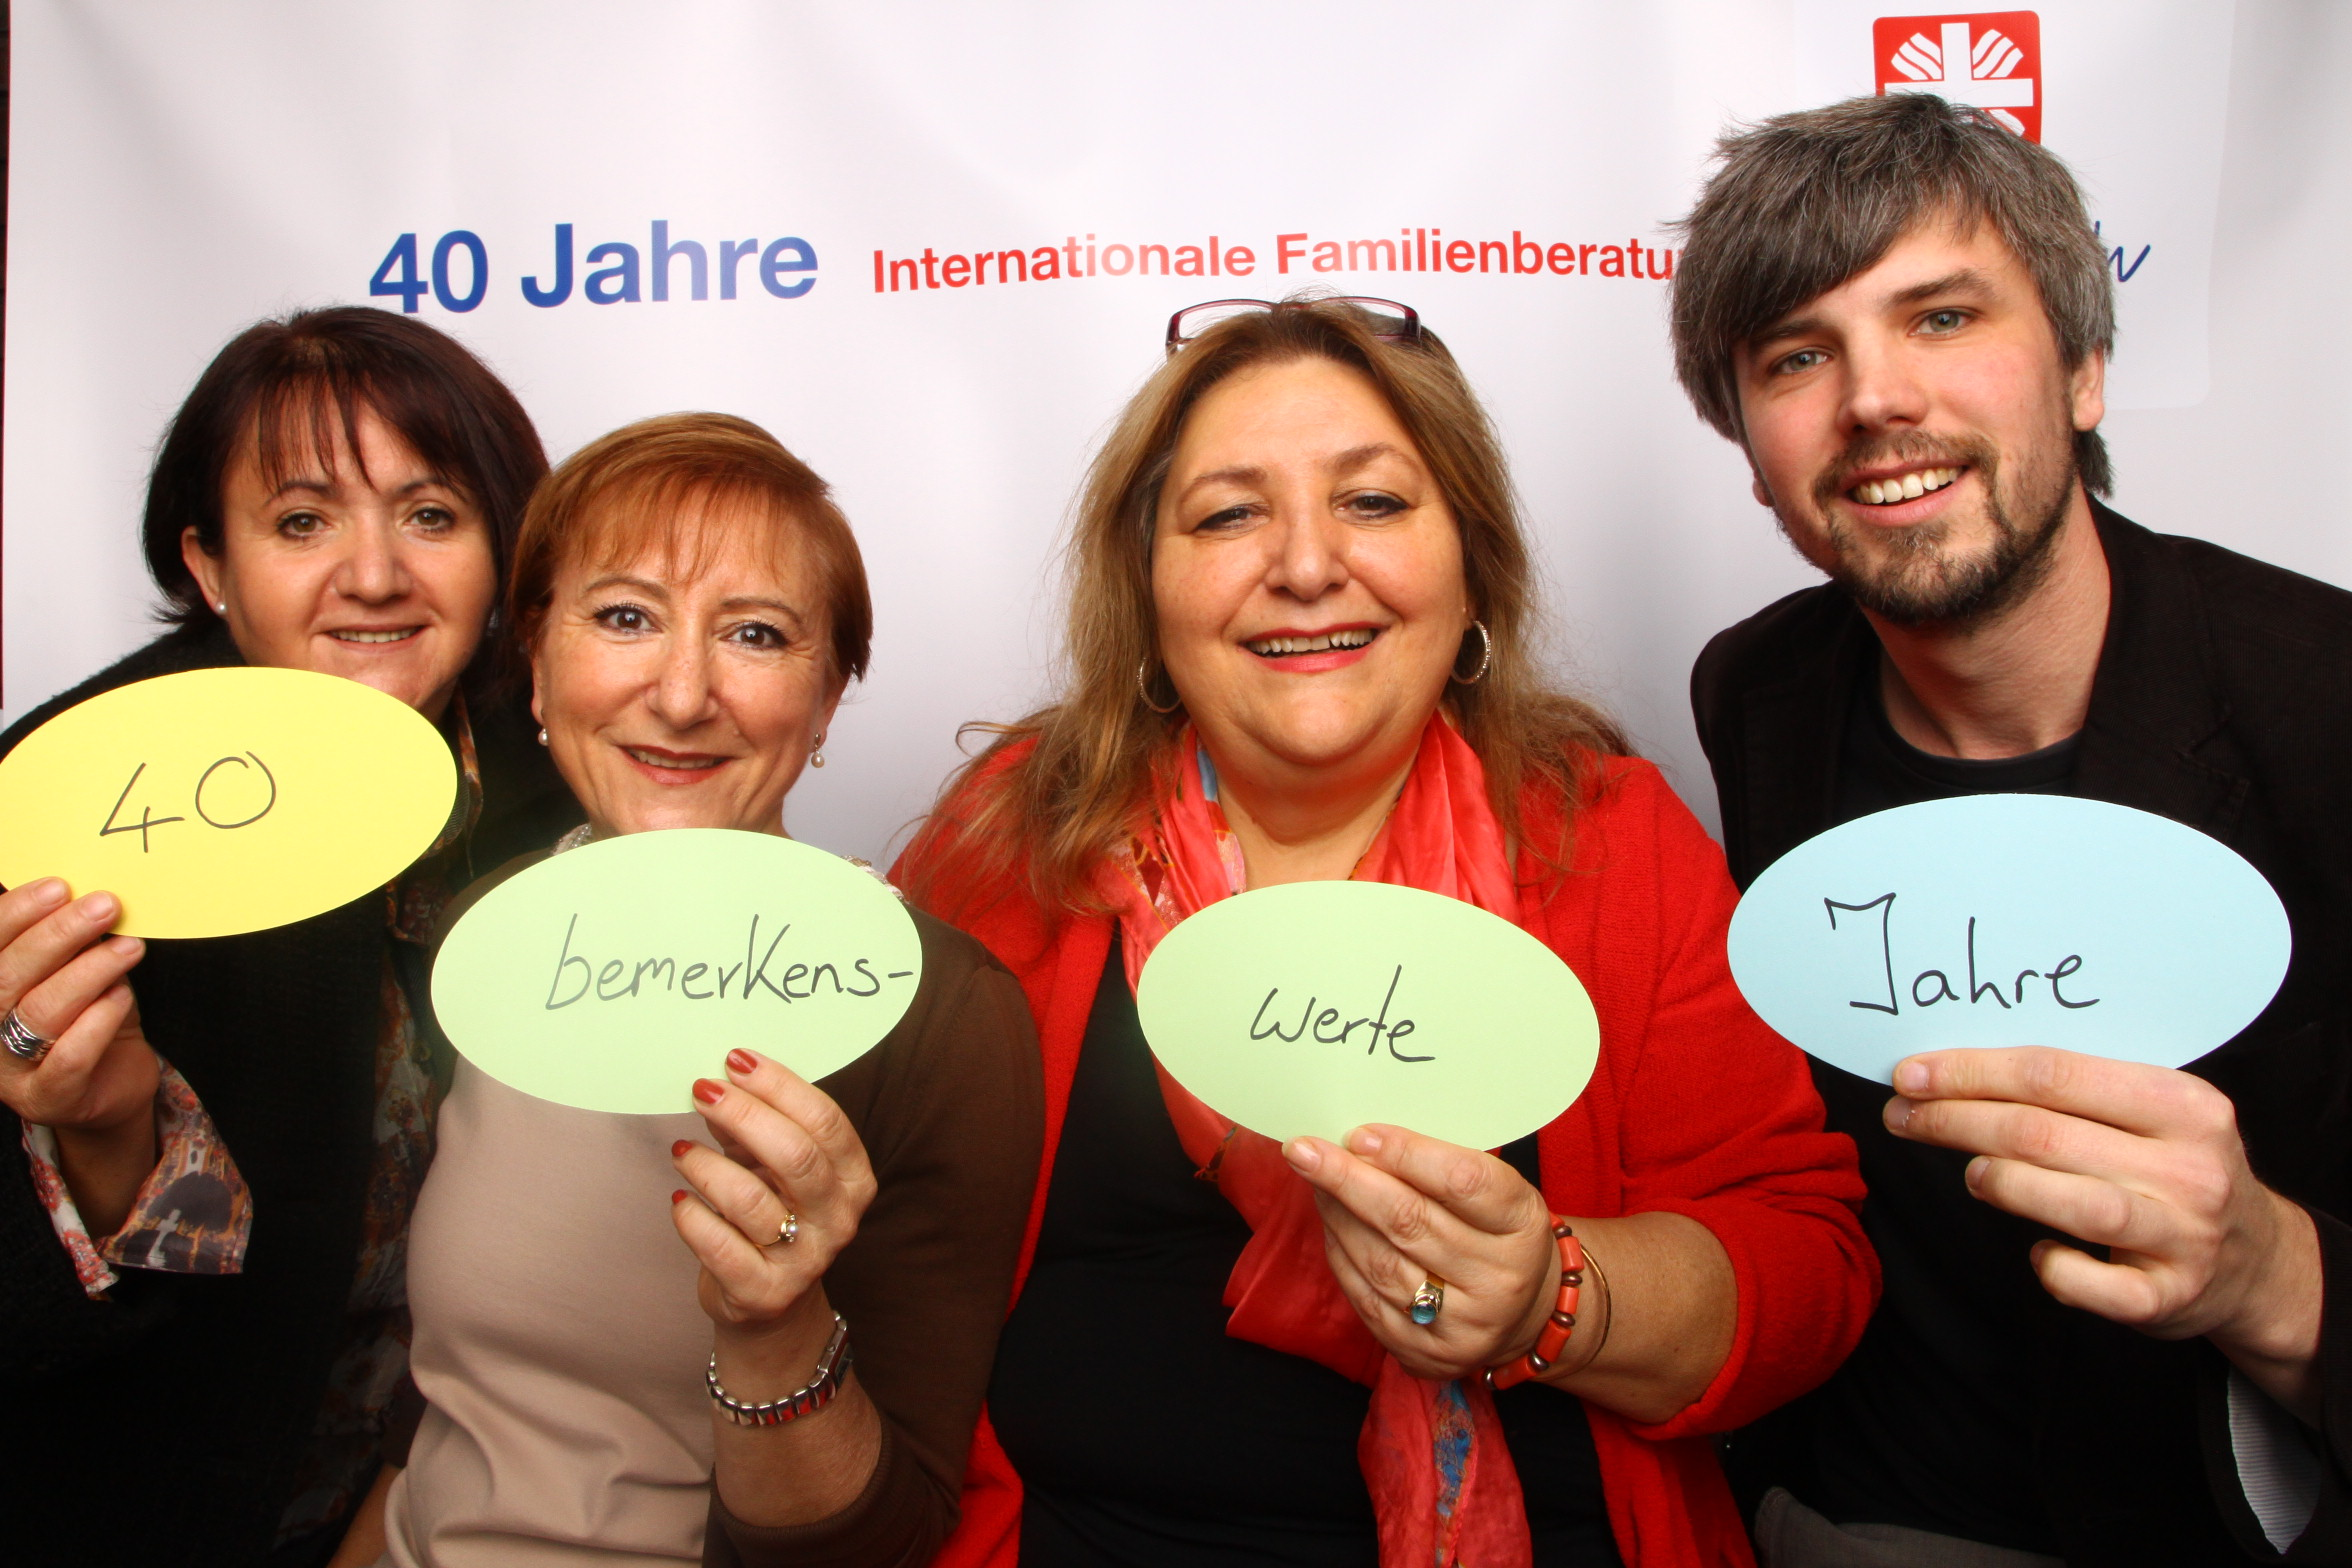 40 Jahre Internationale Familienberatung (2)